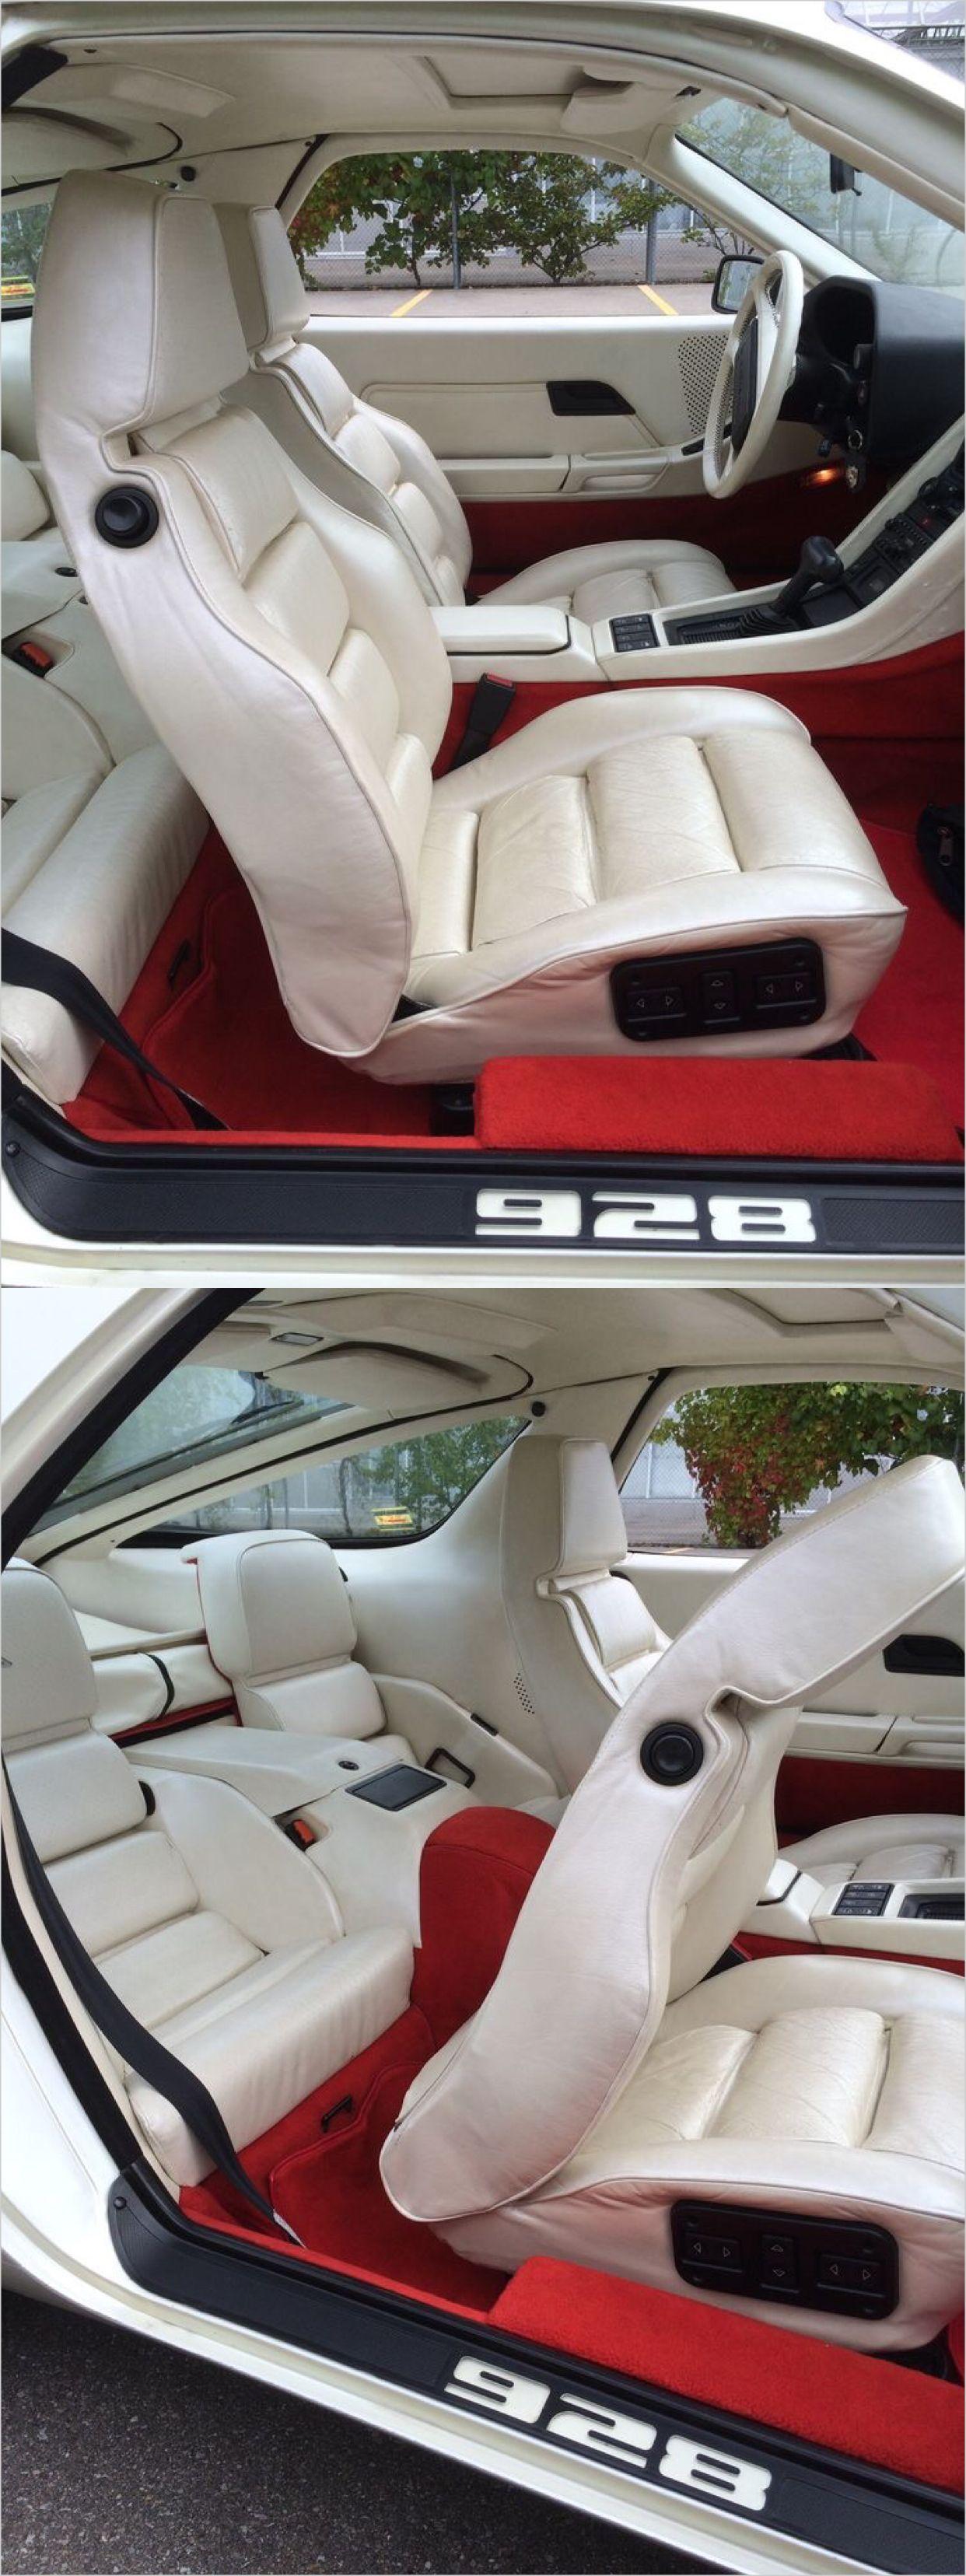 1983 Porsche 928s Interior Of Pearl White Car Custom Car